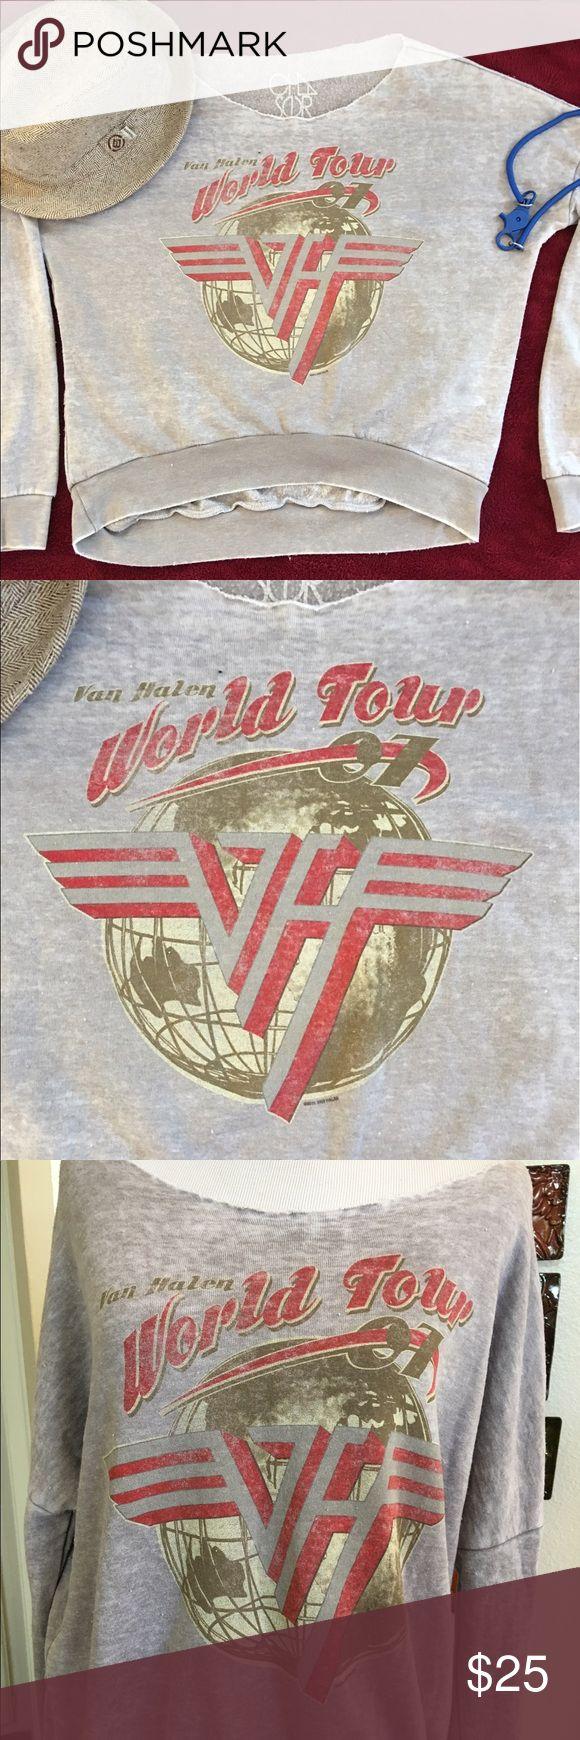 VAN HALEN WORLD TOUR SWEATSHIRT Ladies XS fits large. 80's off the shoulder. Longer in back. 50 cotton/50 poly. Worn 1 time. In perfect condition! cha sor Tops Sweatshirts & Hoodies